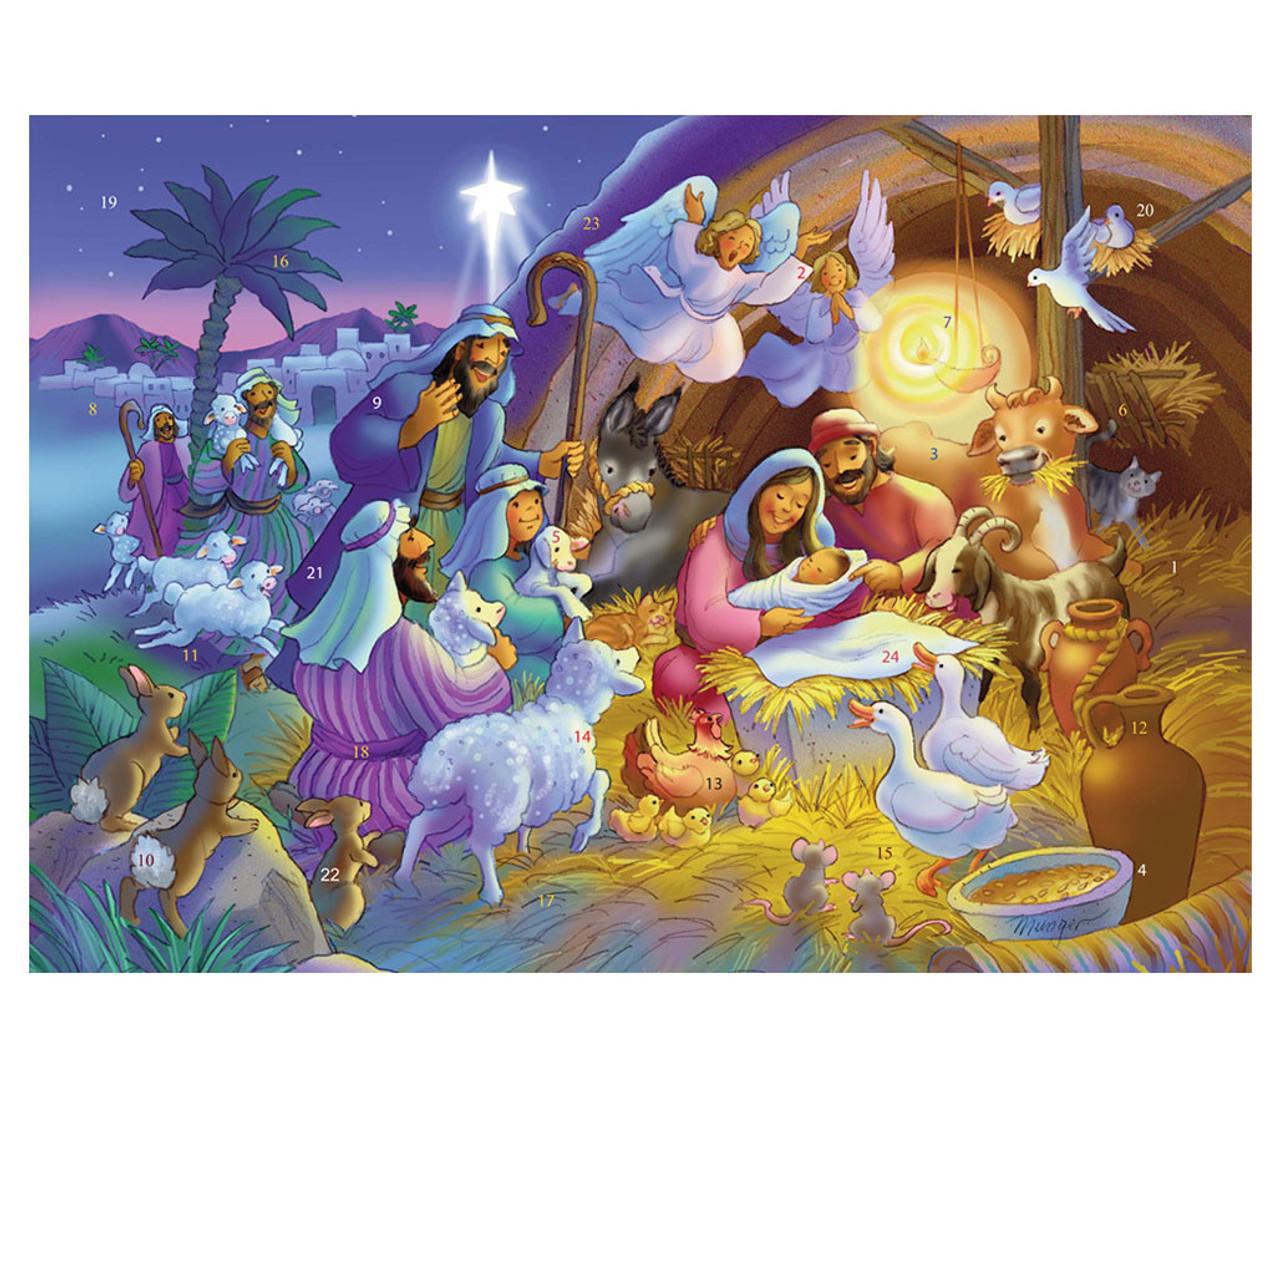 Heavenly Night Advent Calendar